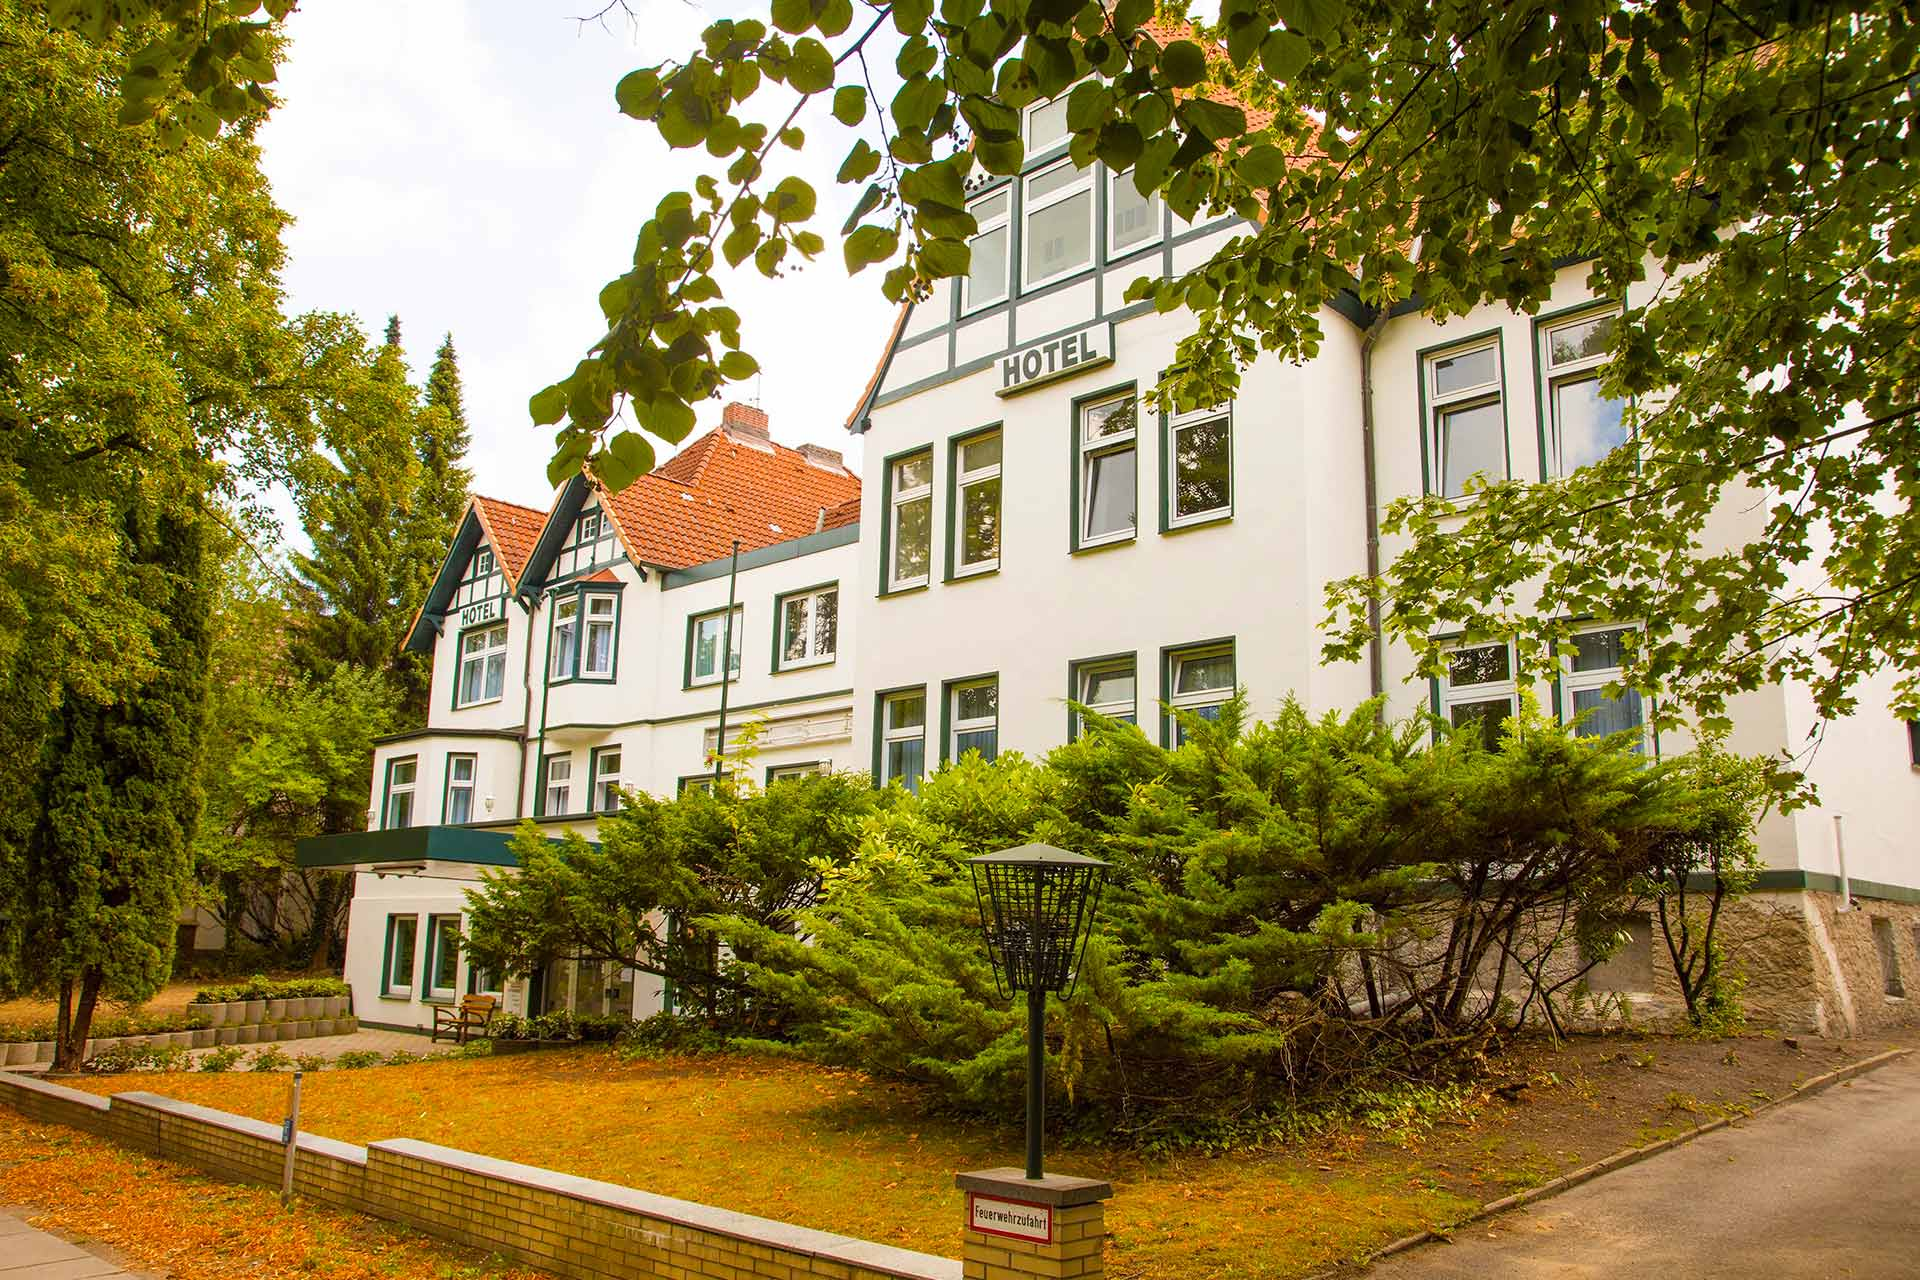 Hotel Heimfeld Harburg